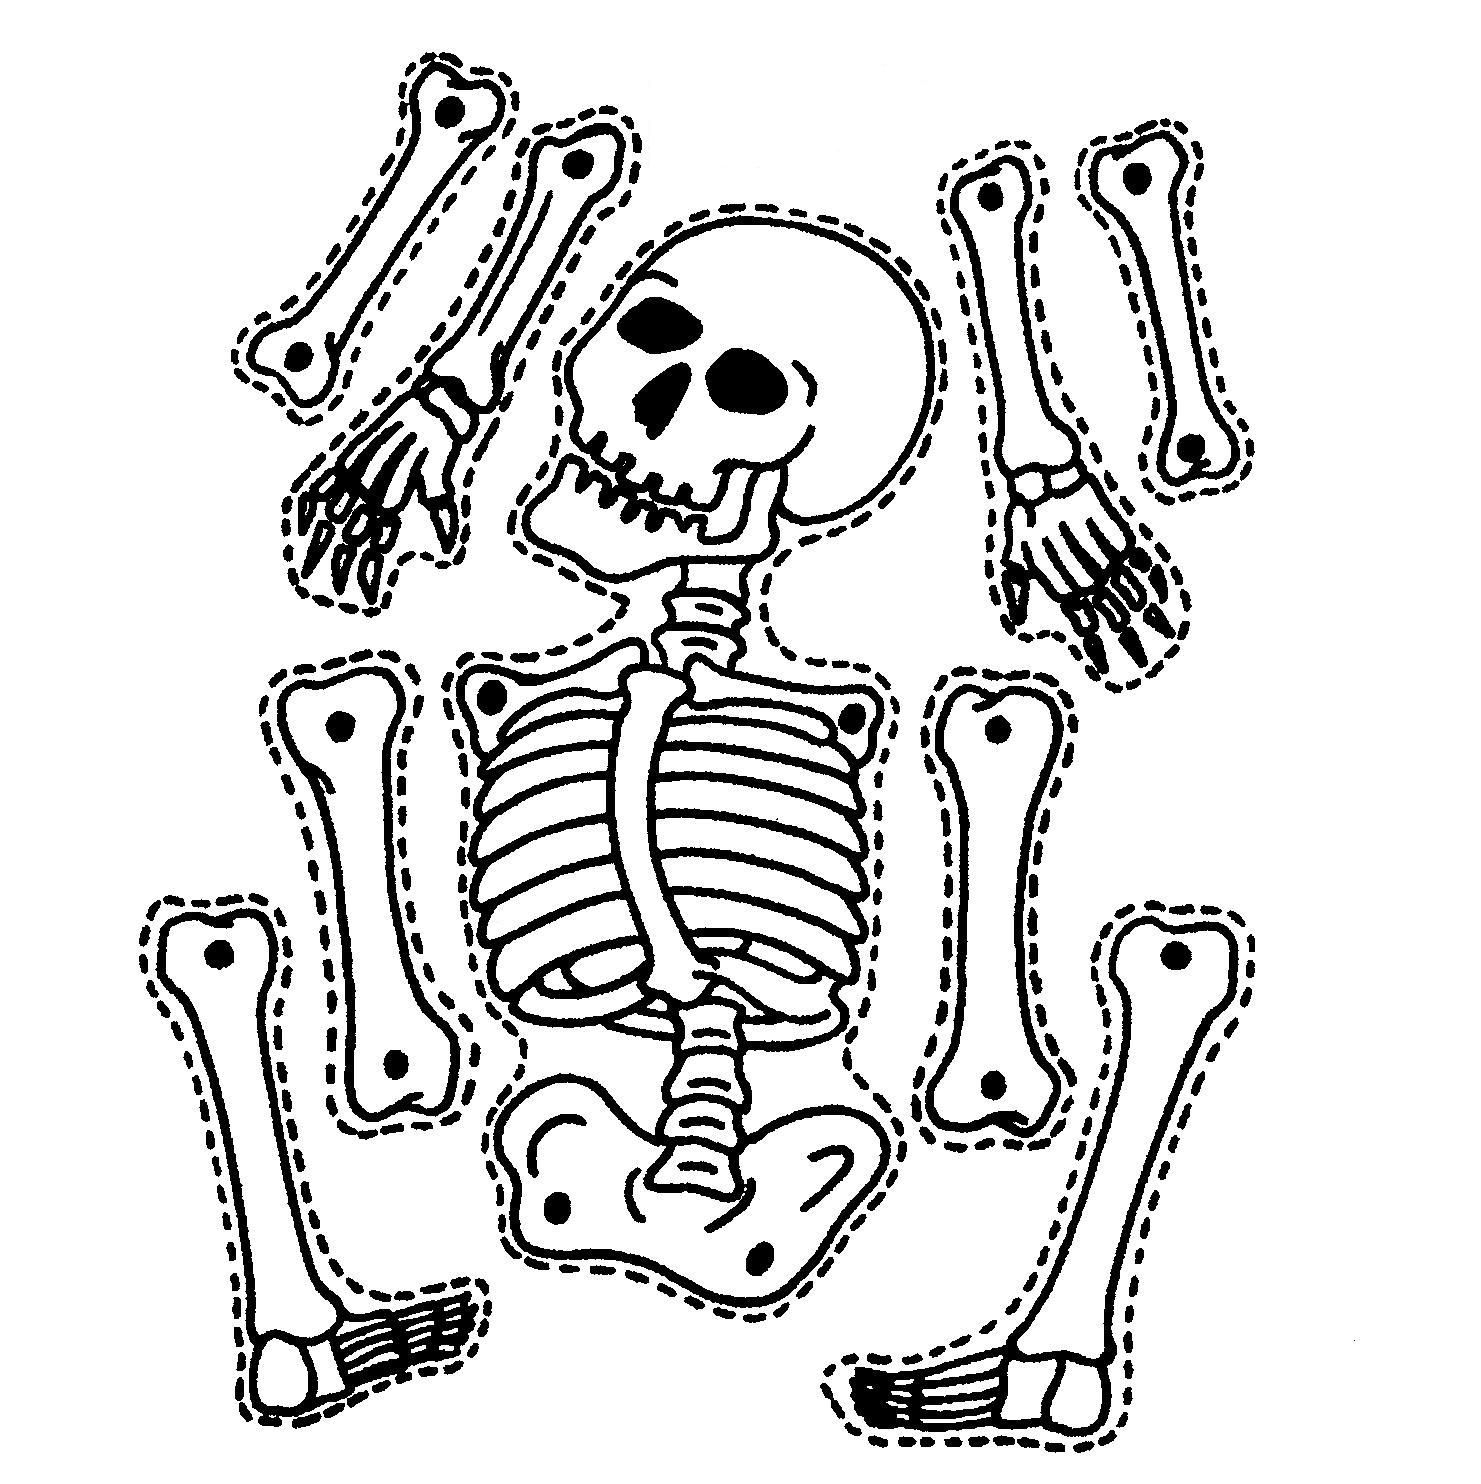 9 Printable Skeleton Crafts | Printable Pages | Halloween Skeletons - Printable Skeleton Puzzle